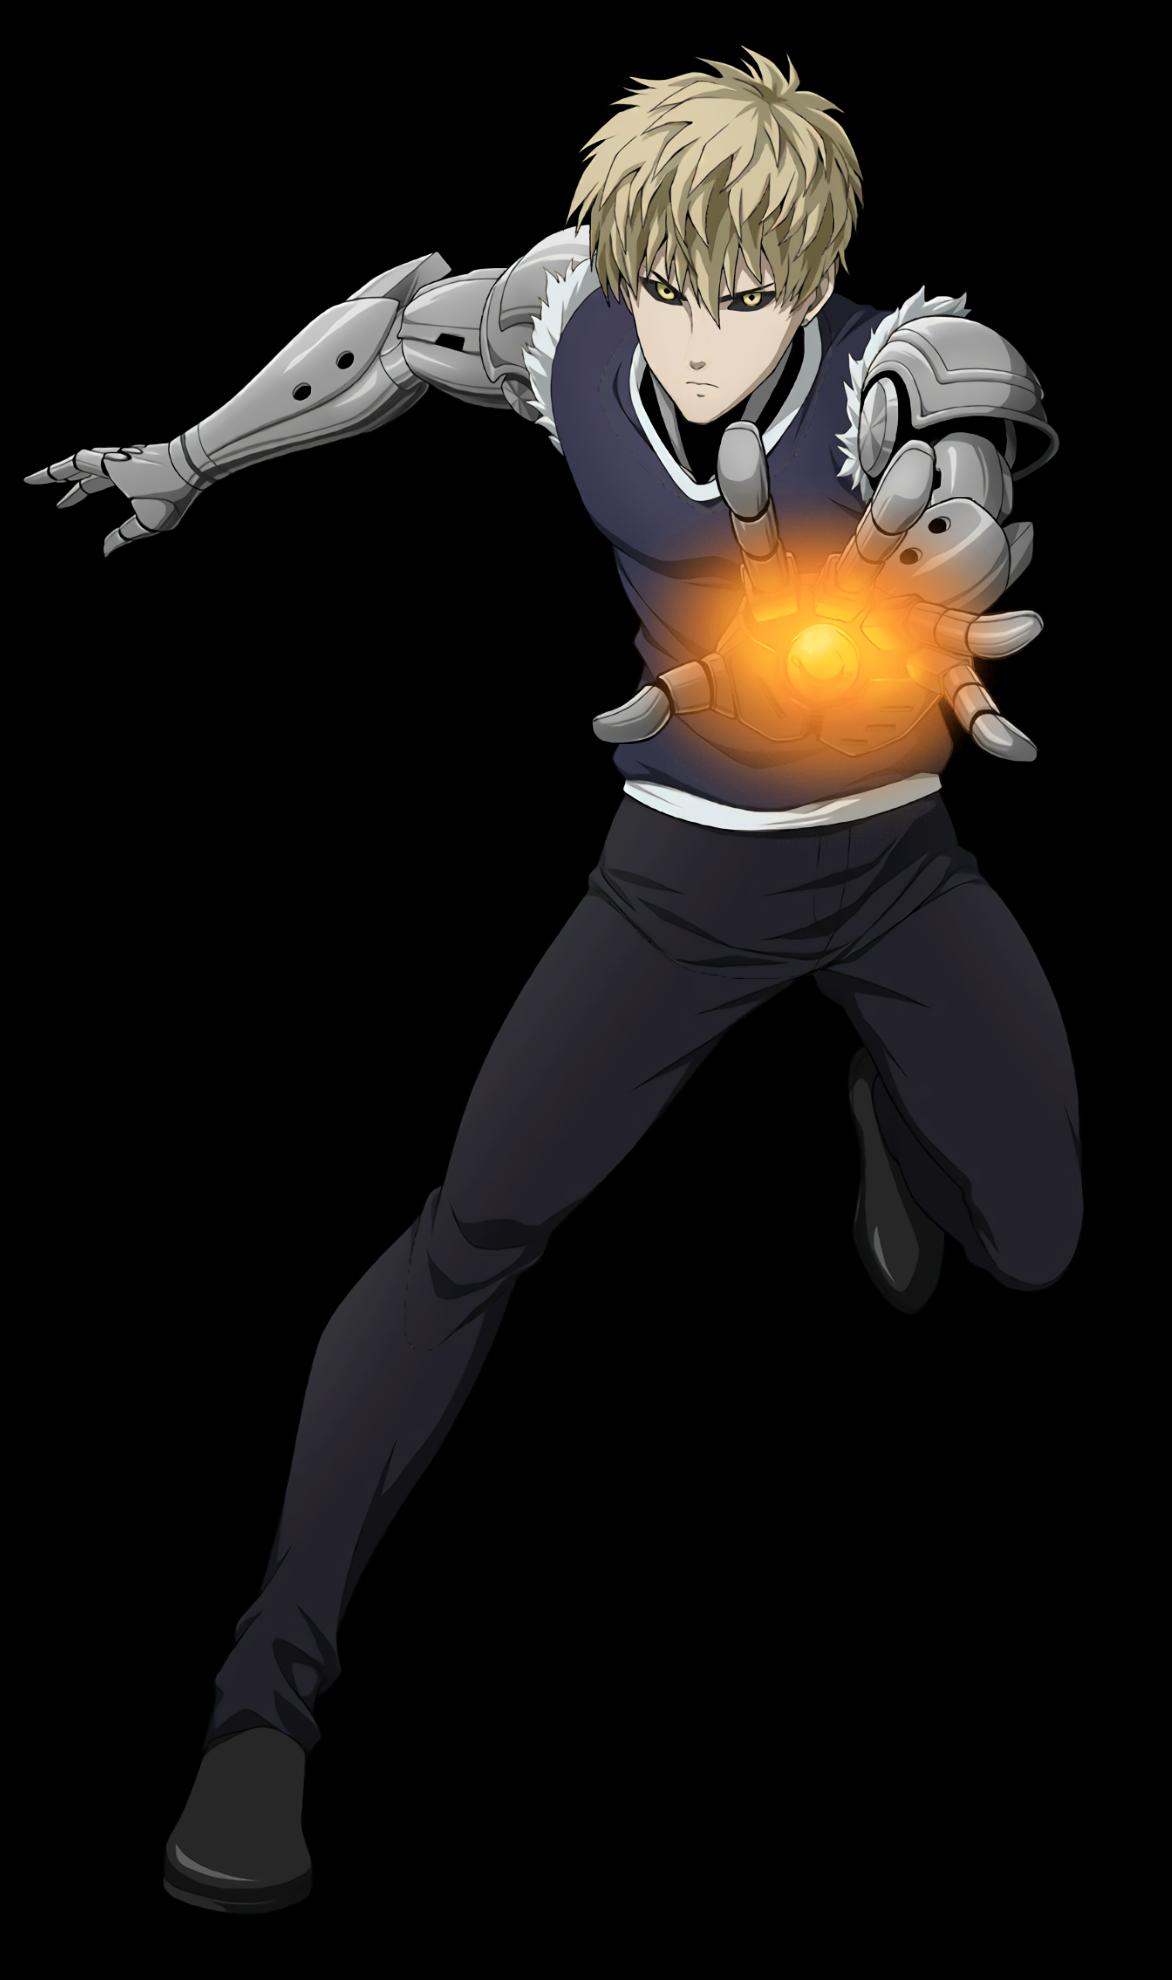 Genos (One Punch Man)